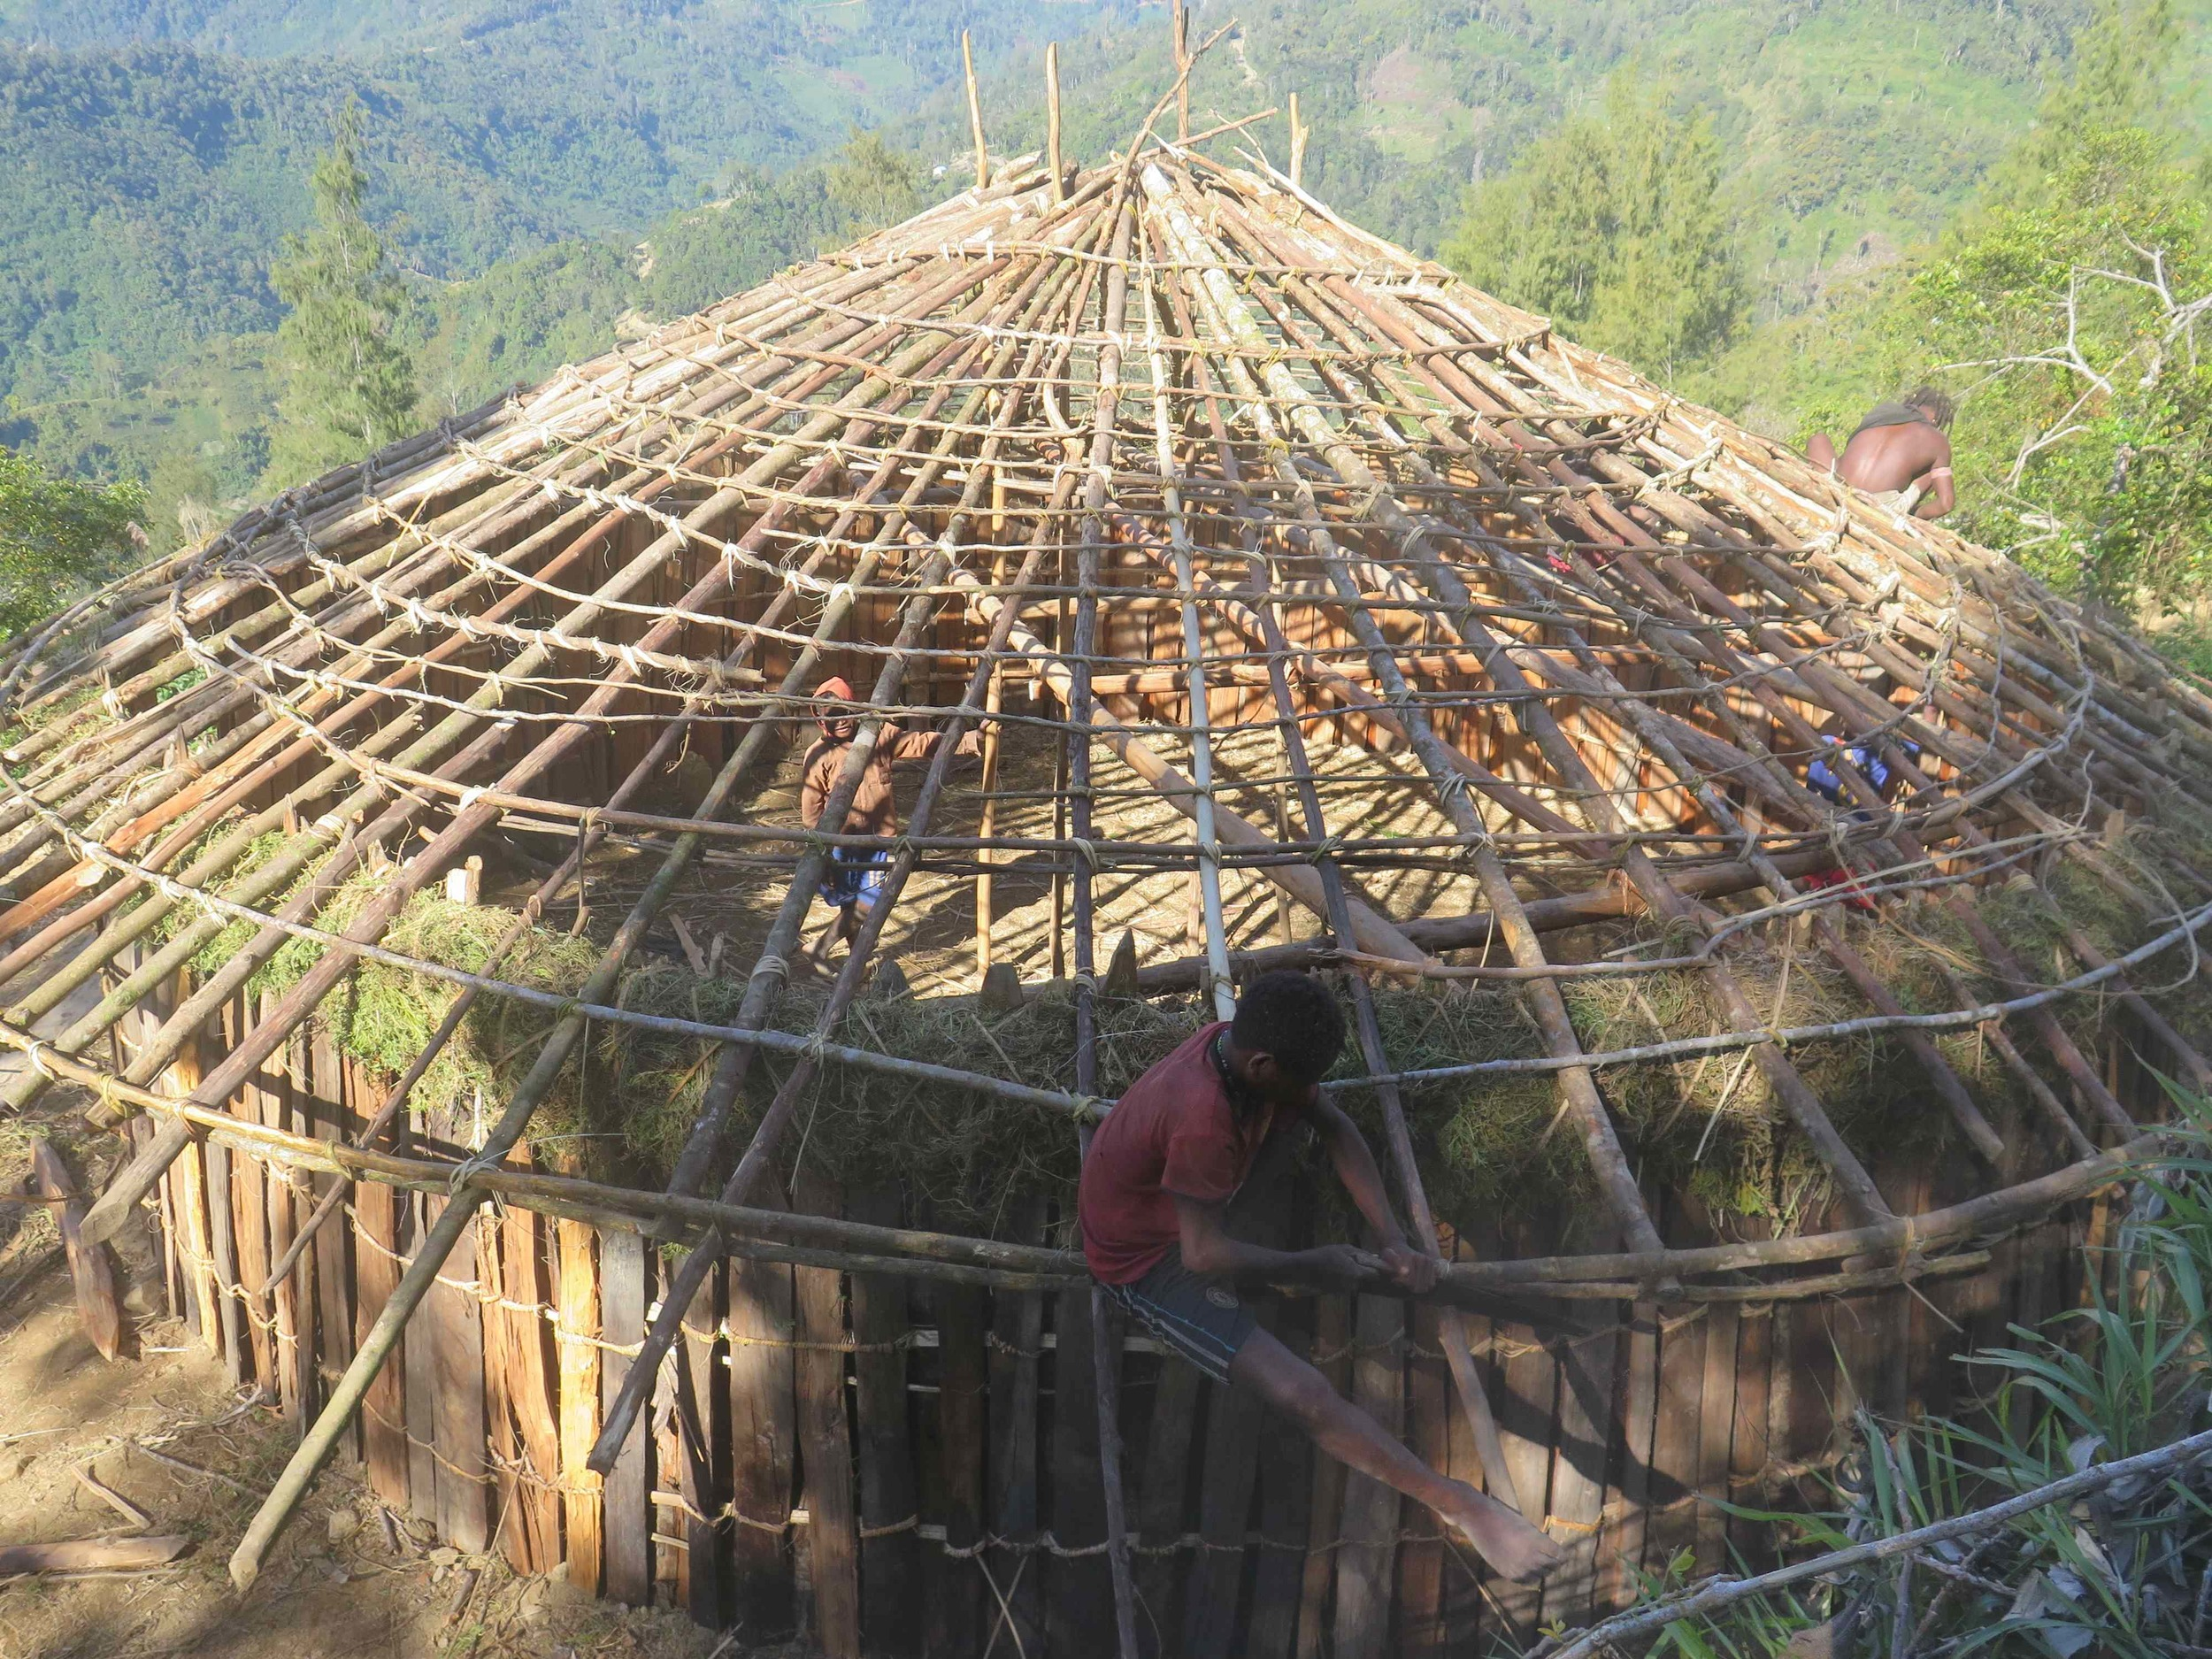 Suangama koyu / Suangama village